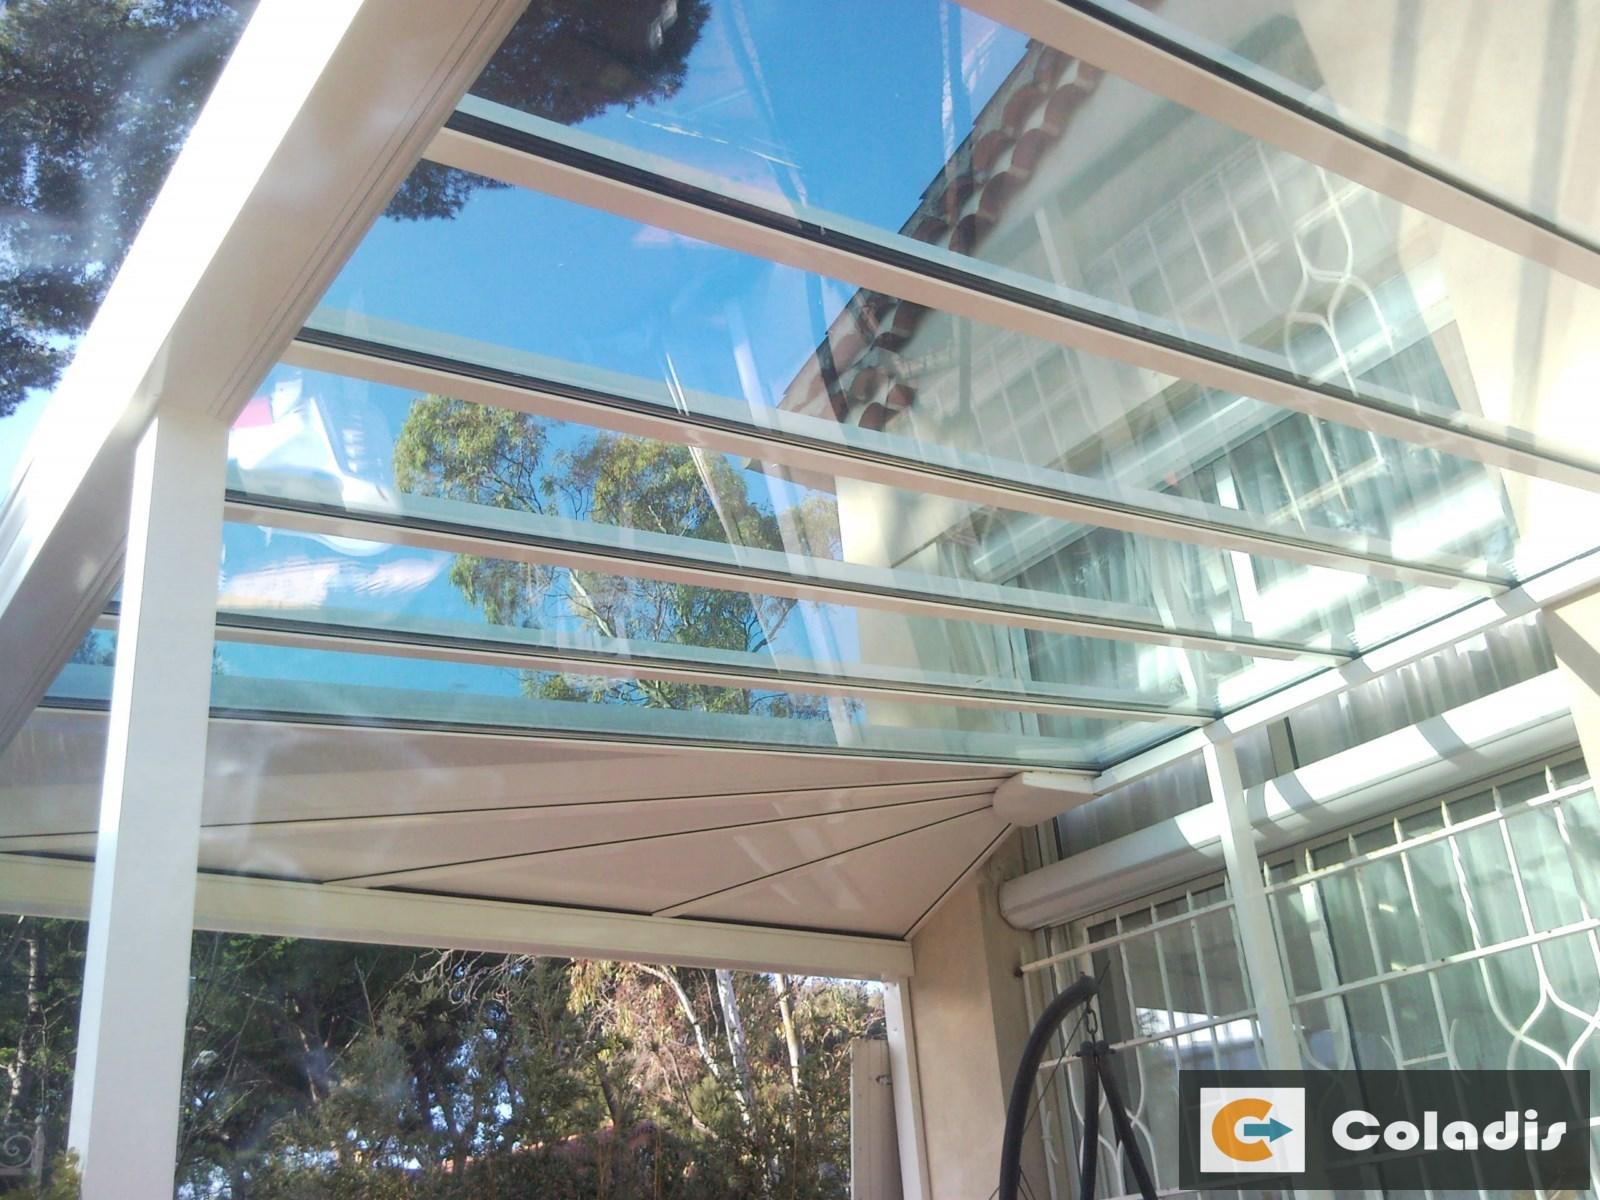 puit de jour toiture veranda mixte aluminium verre béziers